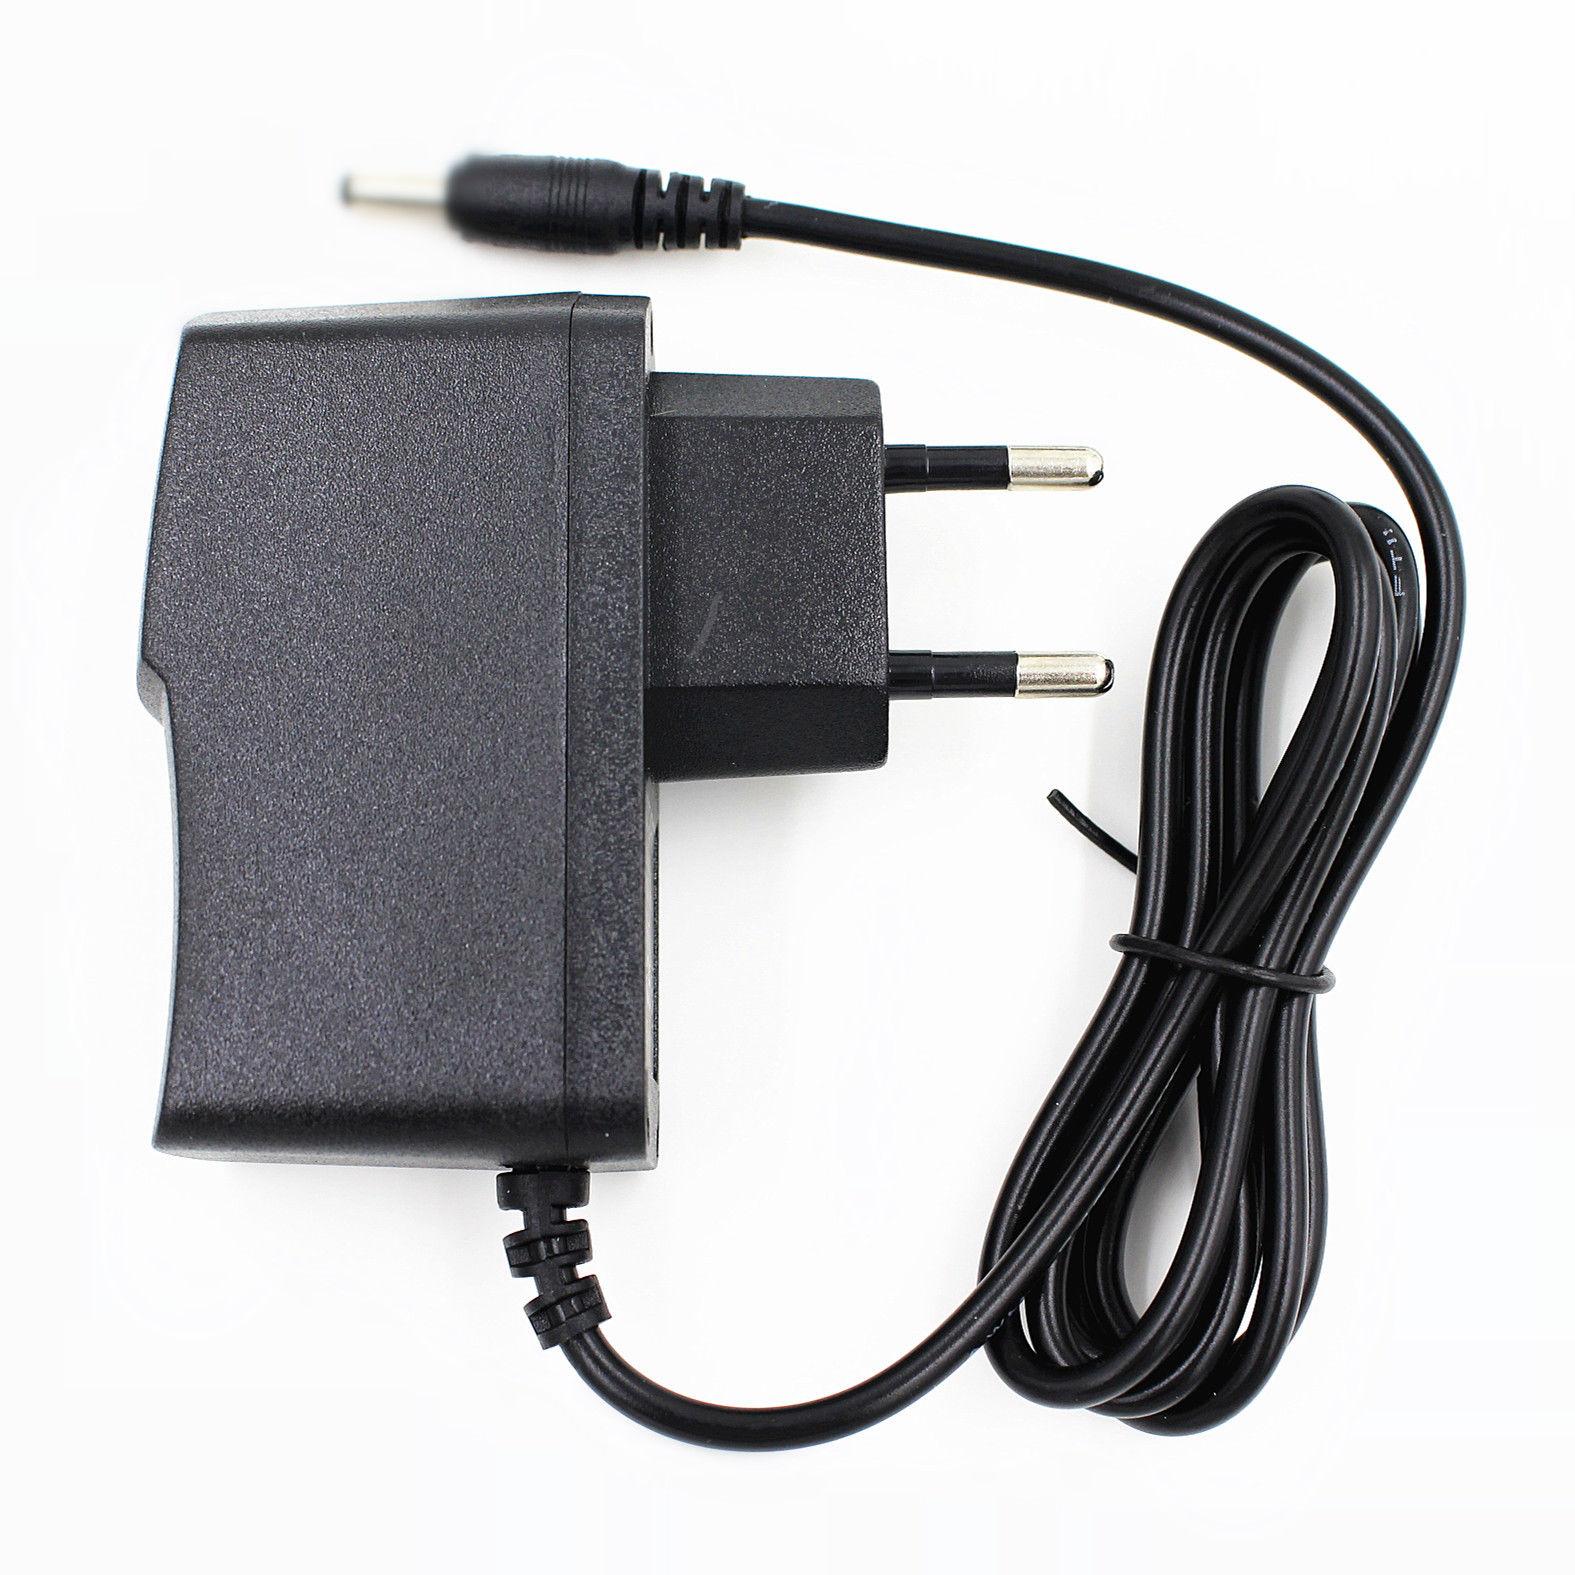 FOR SONY AC-E45HG ACE45HG CD Walkman Discman Supply CAR CHARGER PSU AC DC ADAPTE